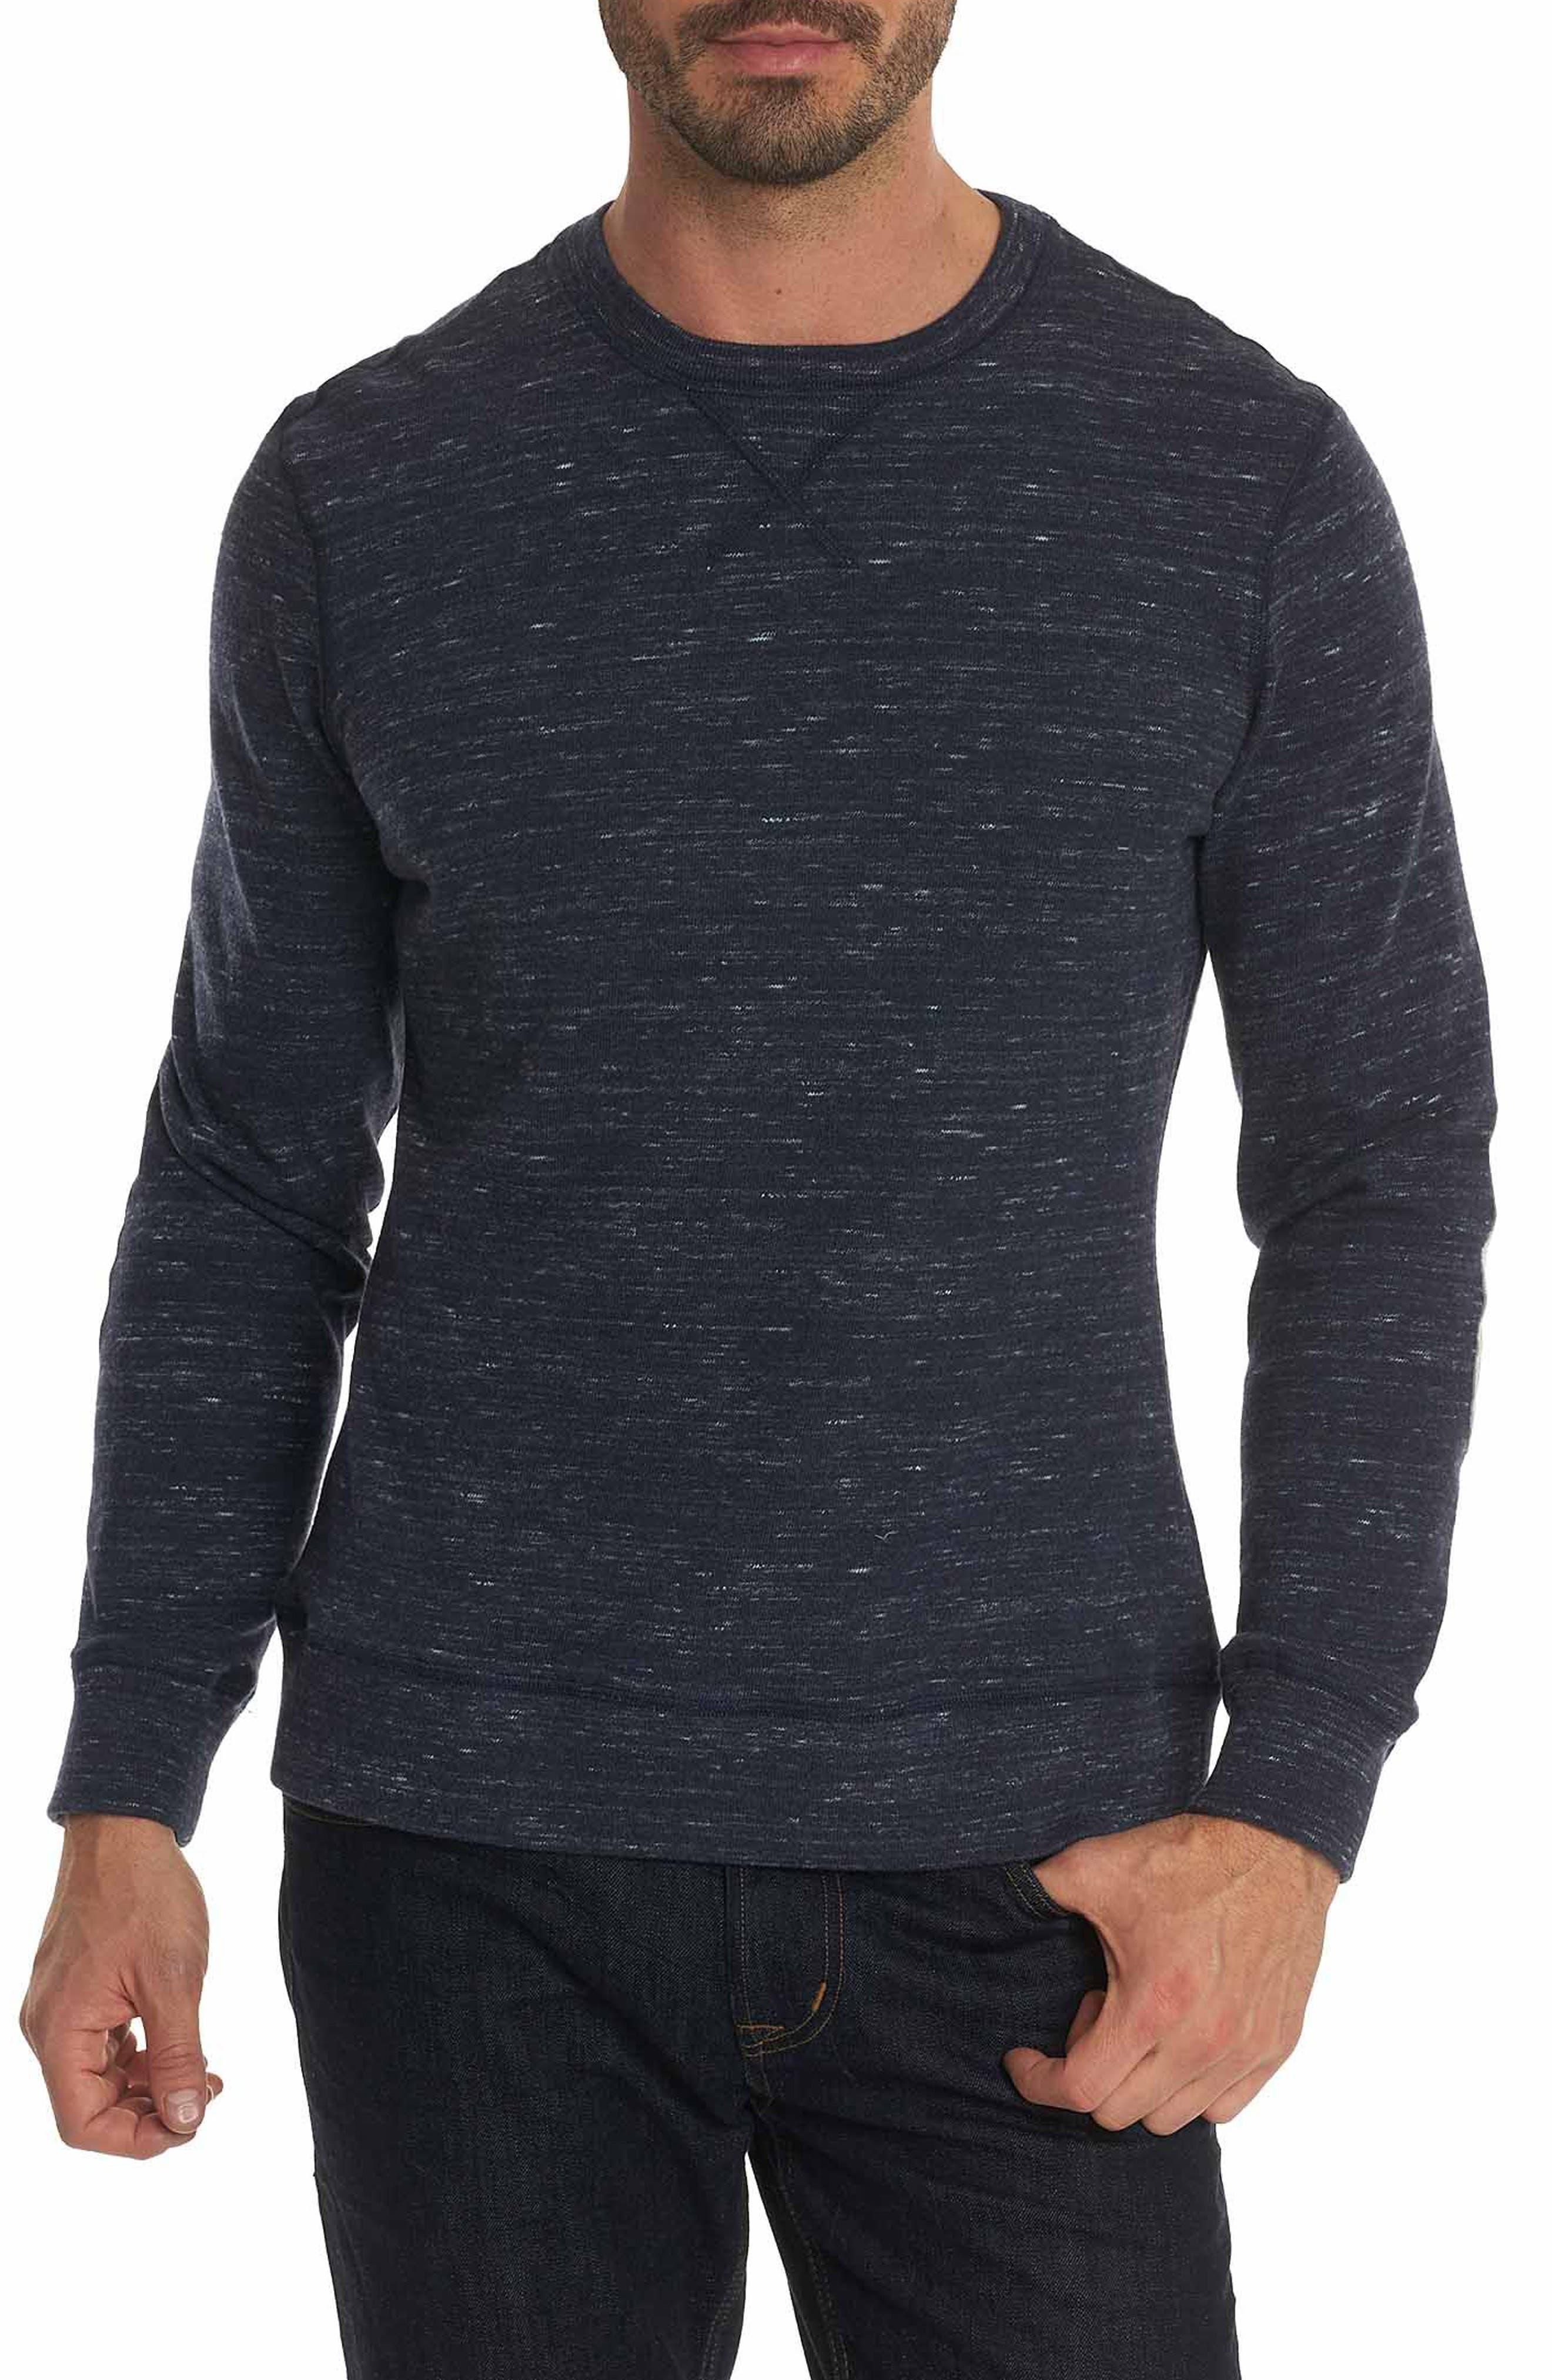 Endurance Elbow Patch Sweatshirt,                         Main,                         color, Heather Navy